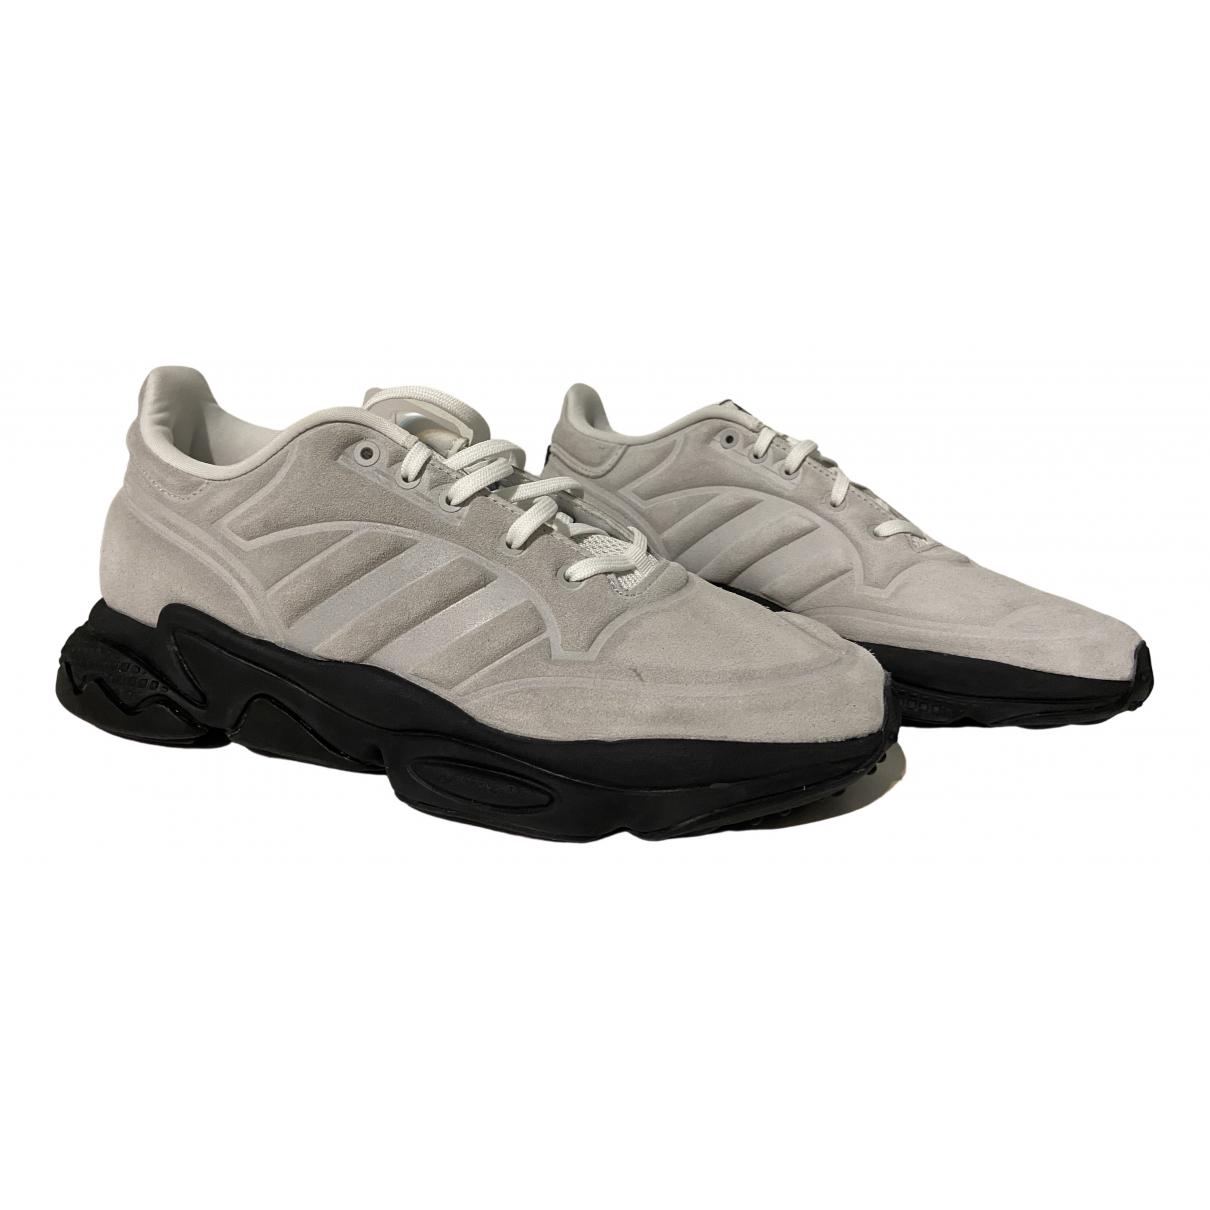 Adidas \N Grey Suede Trainers for Men 40.5 EU